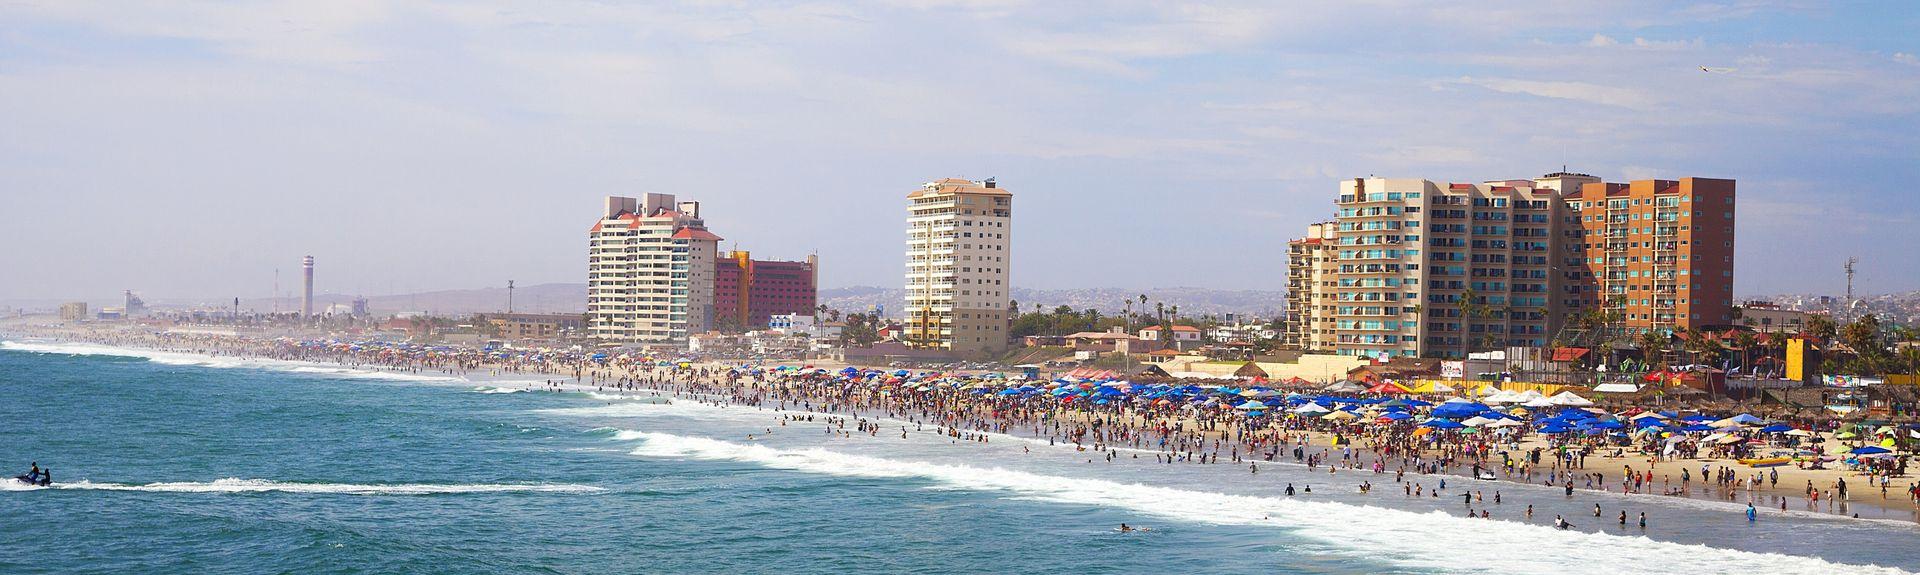 Tijuana, Basse-Californie du Nord, Mexique